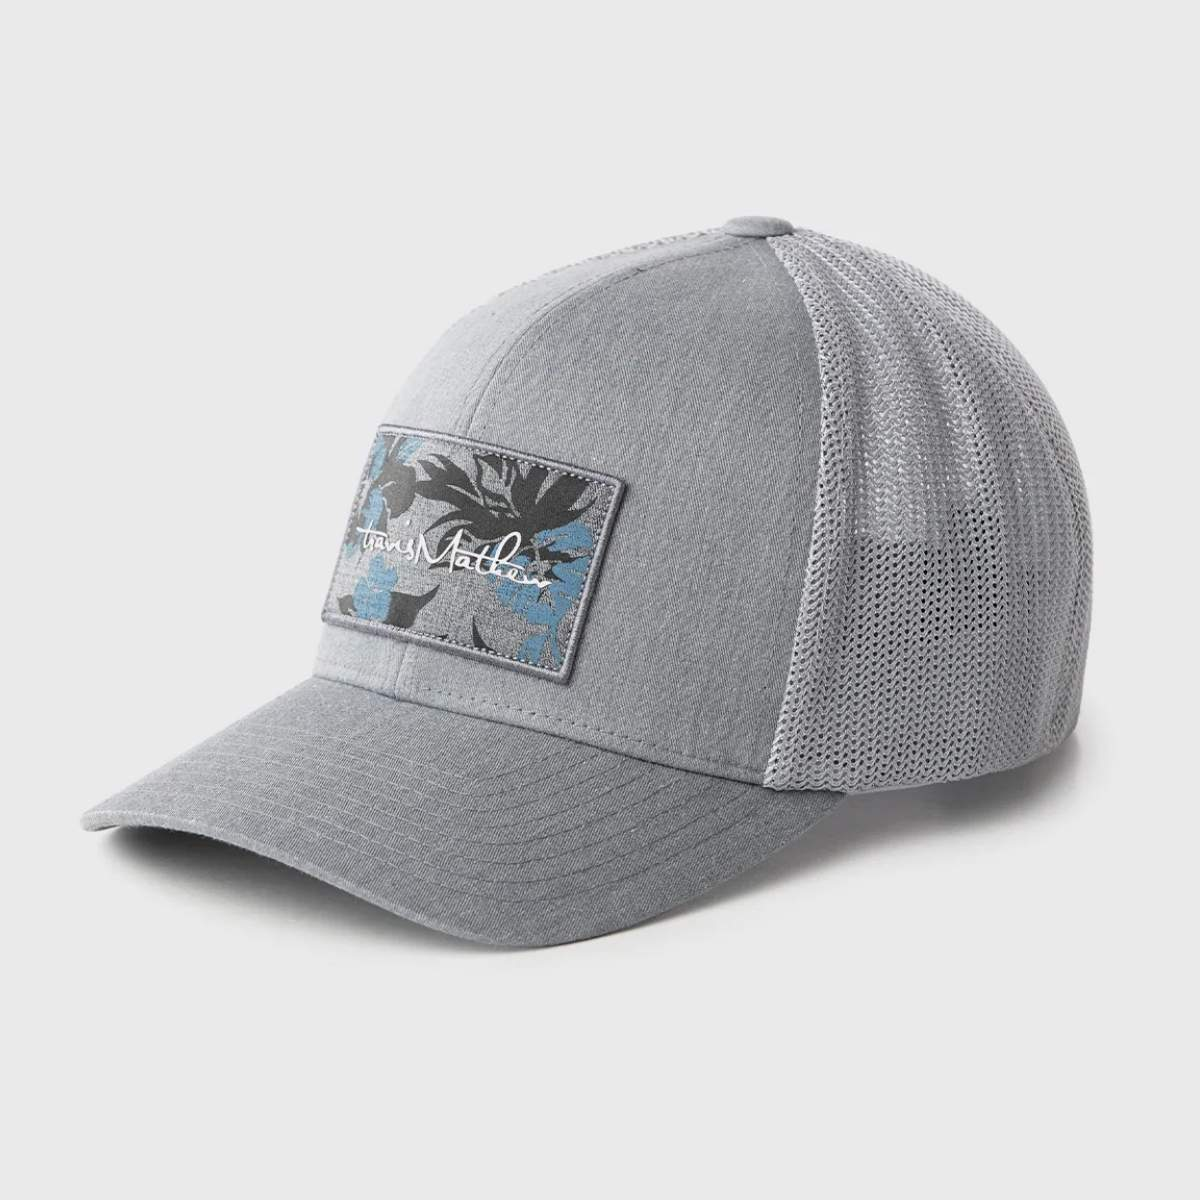 TravisMathew 2021 Sweet Talk Fitted Hat